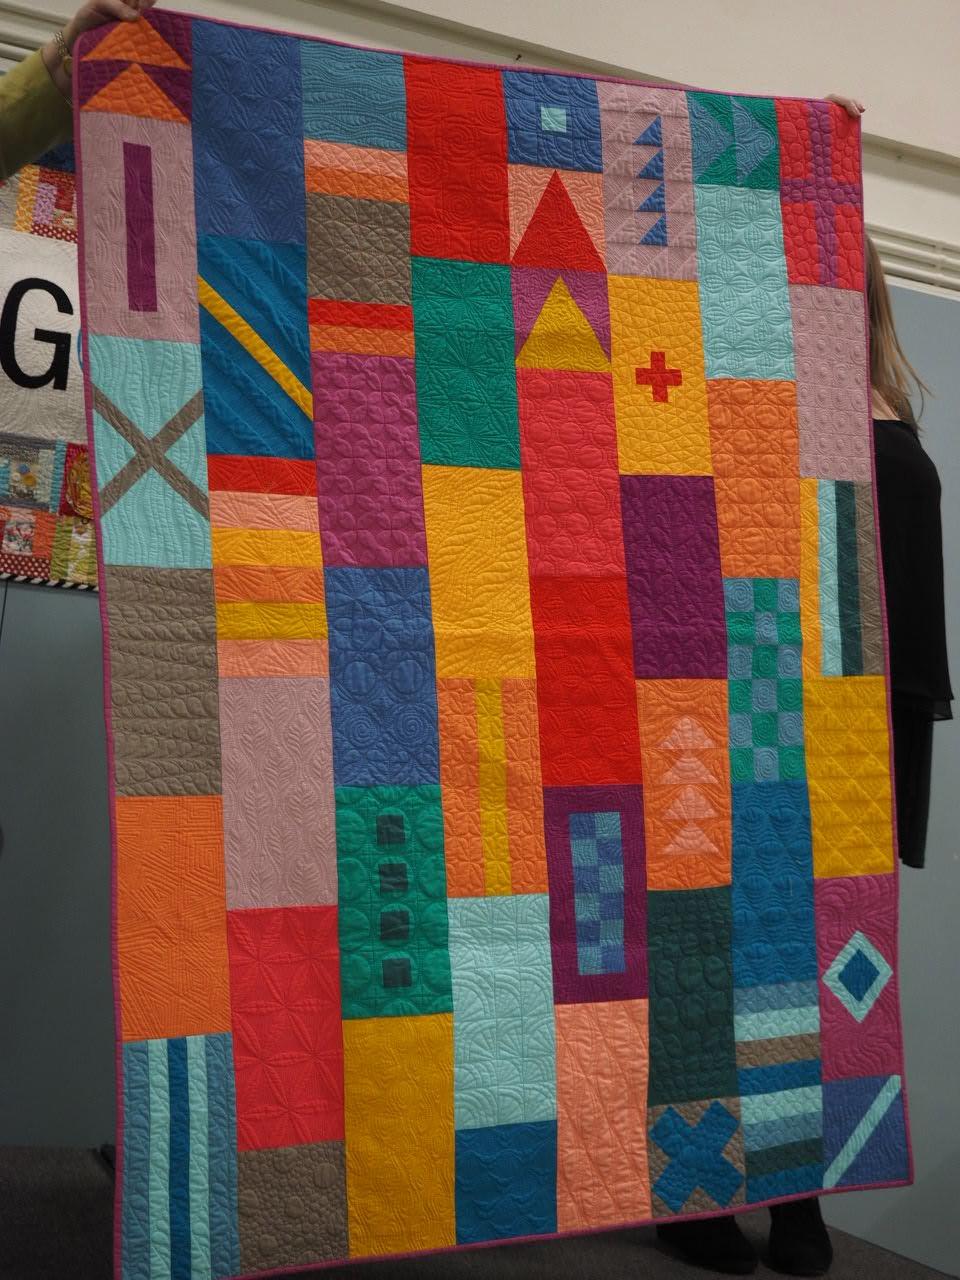 Texture Sampler by Christina Cameli